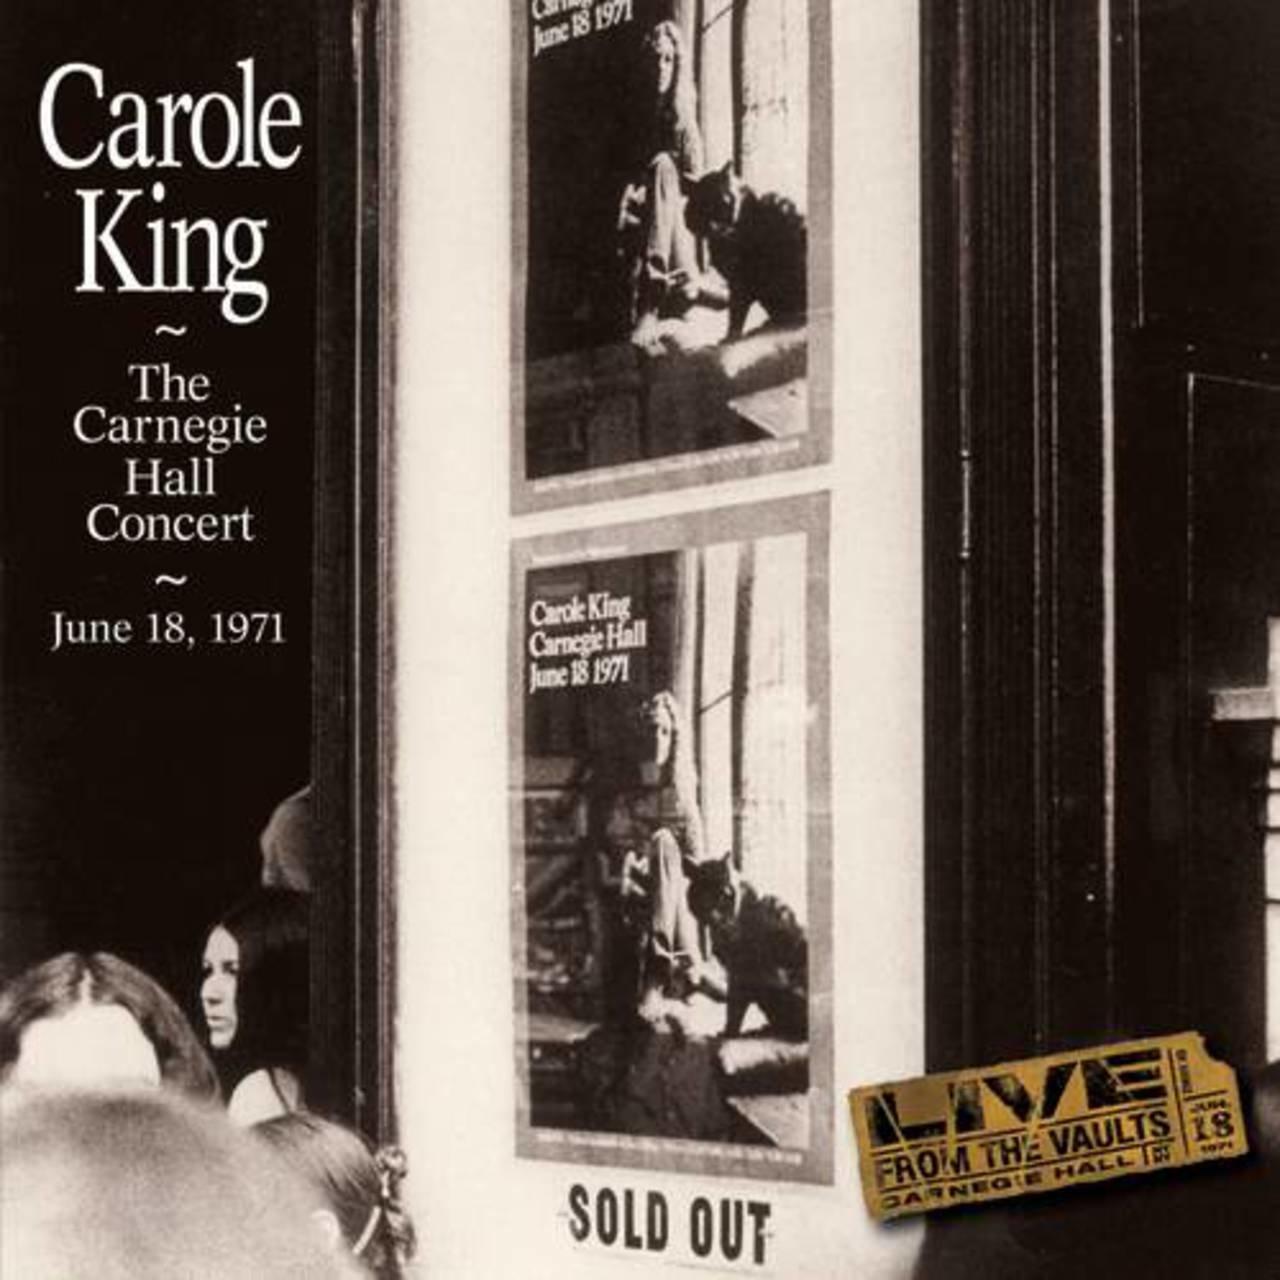 Carole King The Carnegie Hall Concert June 18, 1971 / Carole King TIDAL Part 66